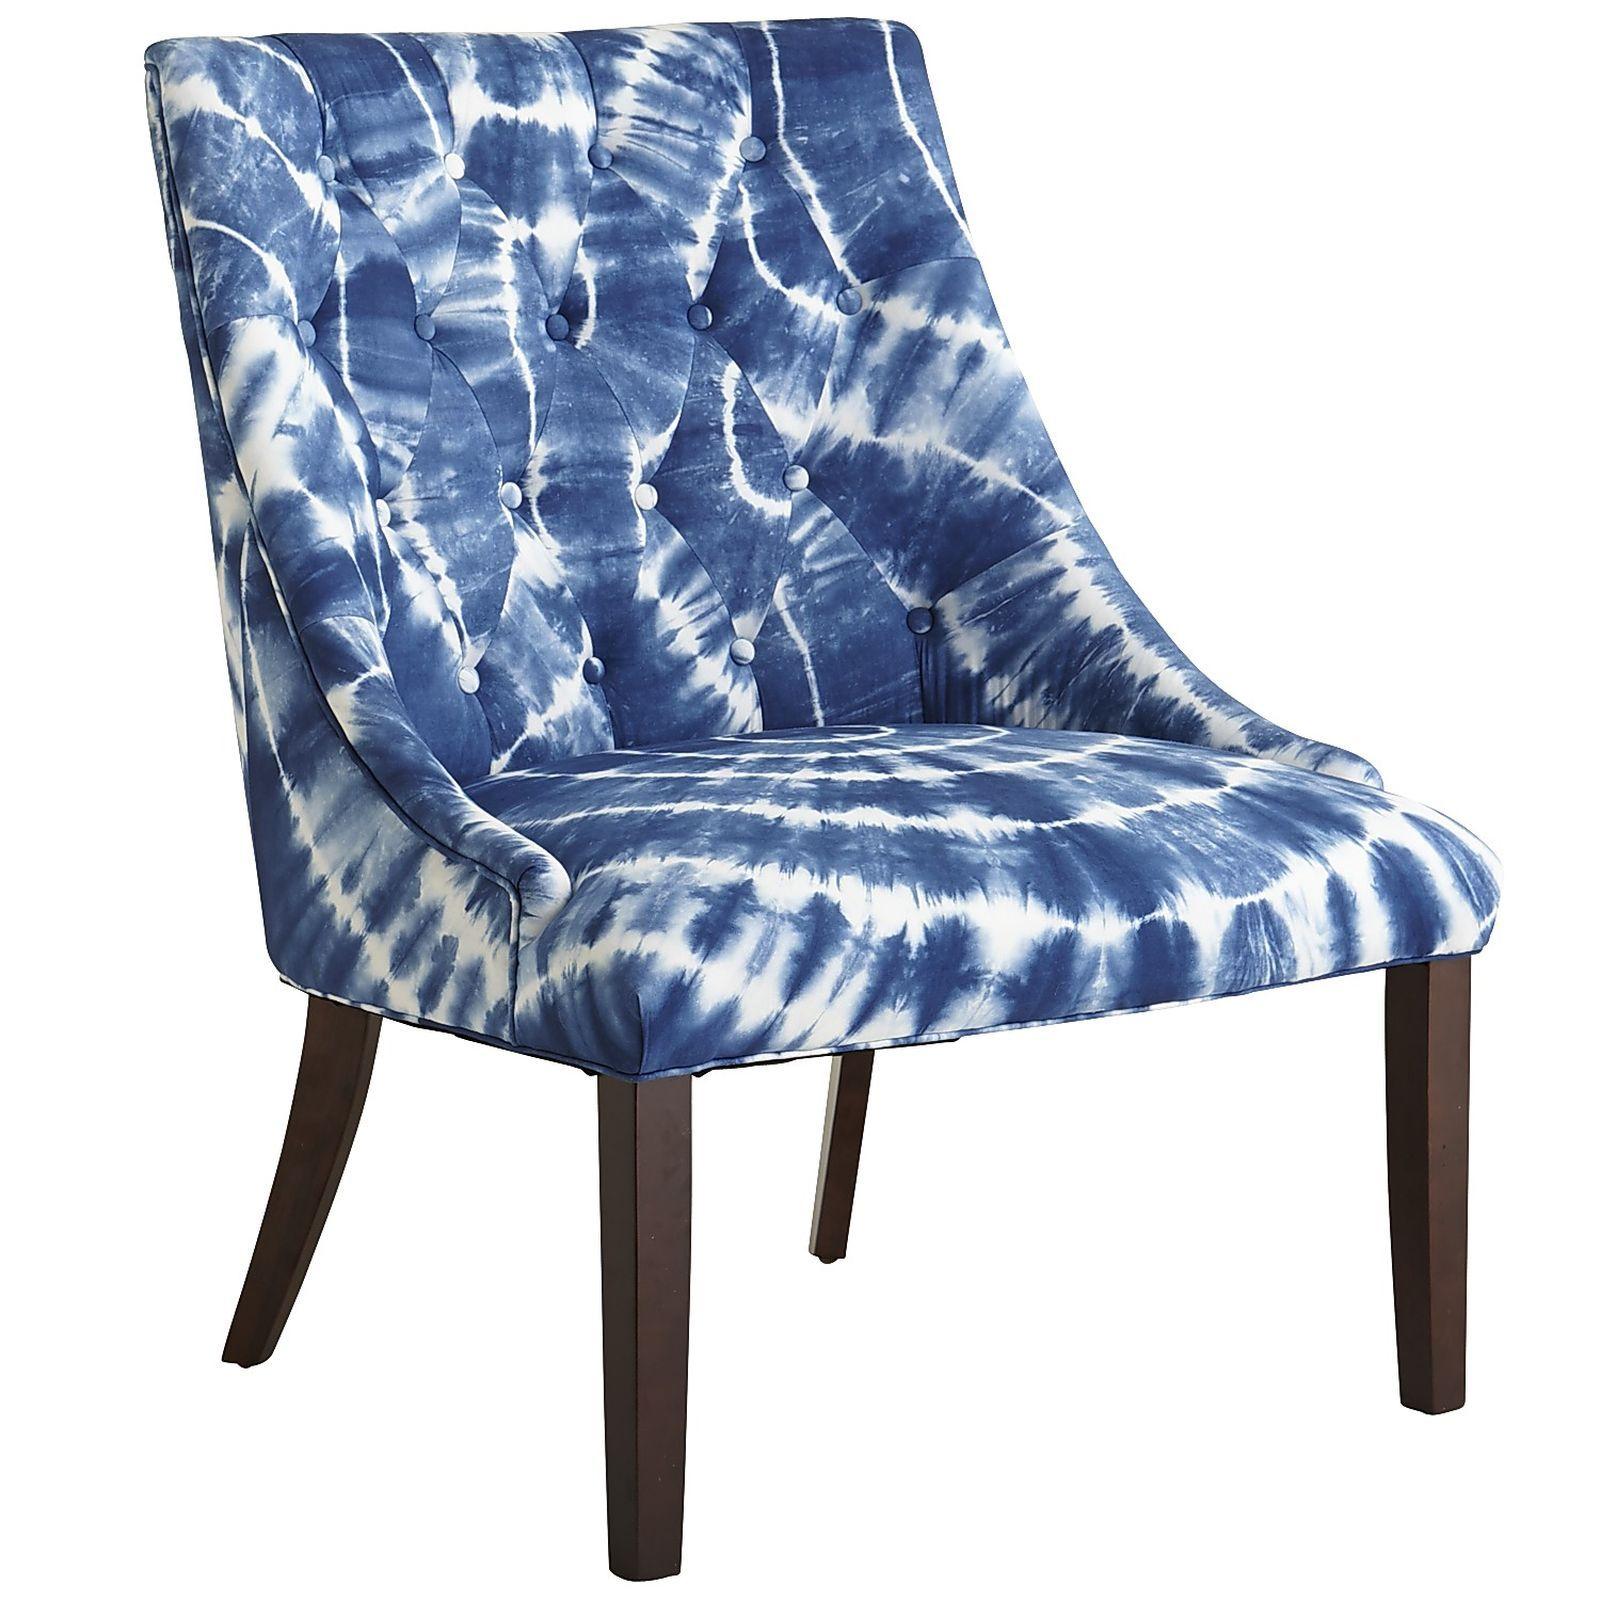 Adriel Chair - Indigo | Pier 1 Imports | furniture re-dos | Accent